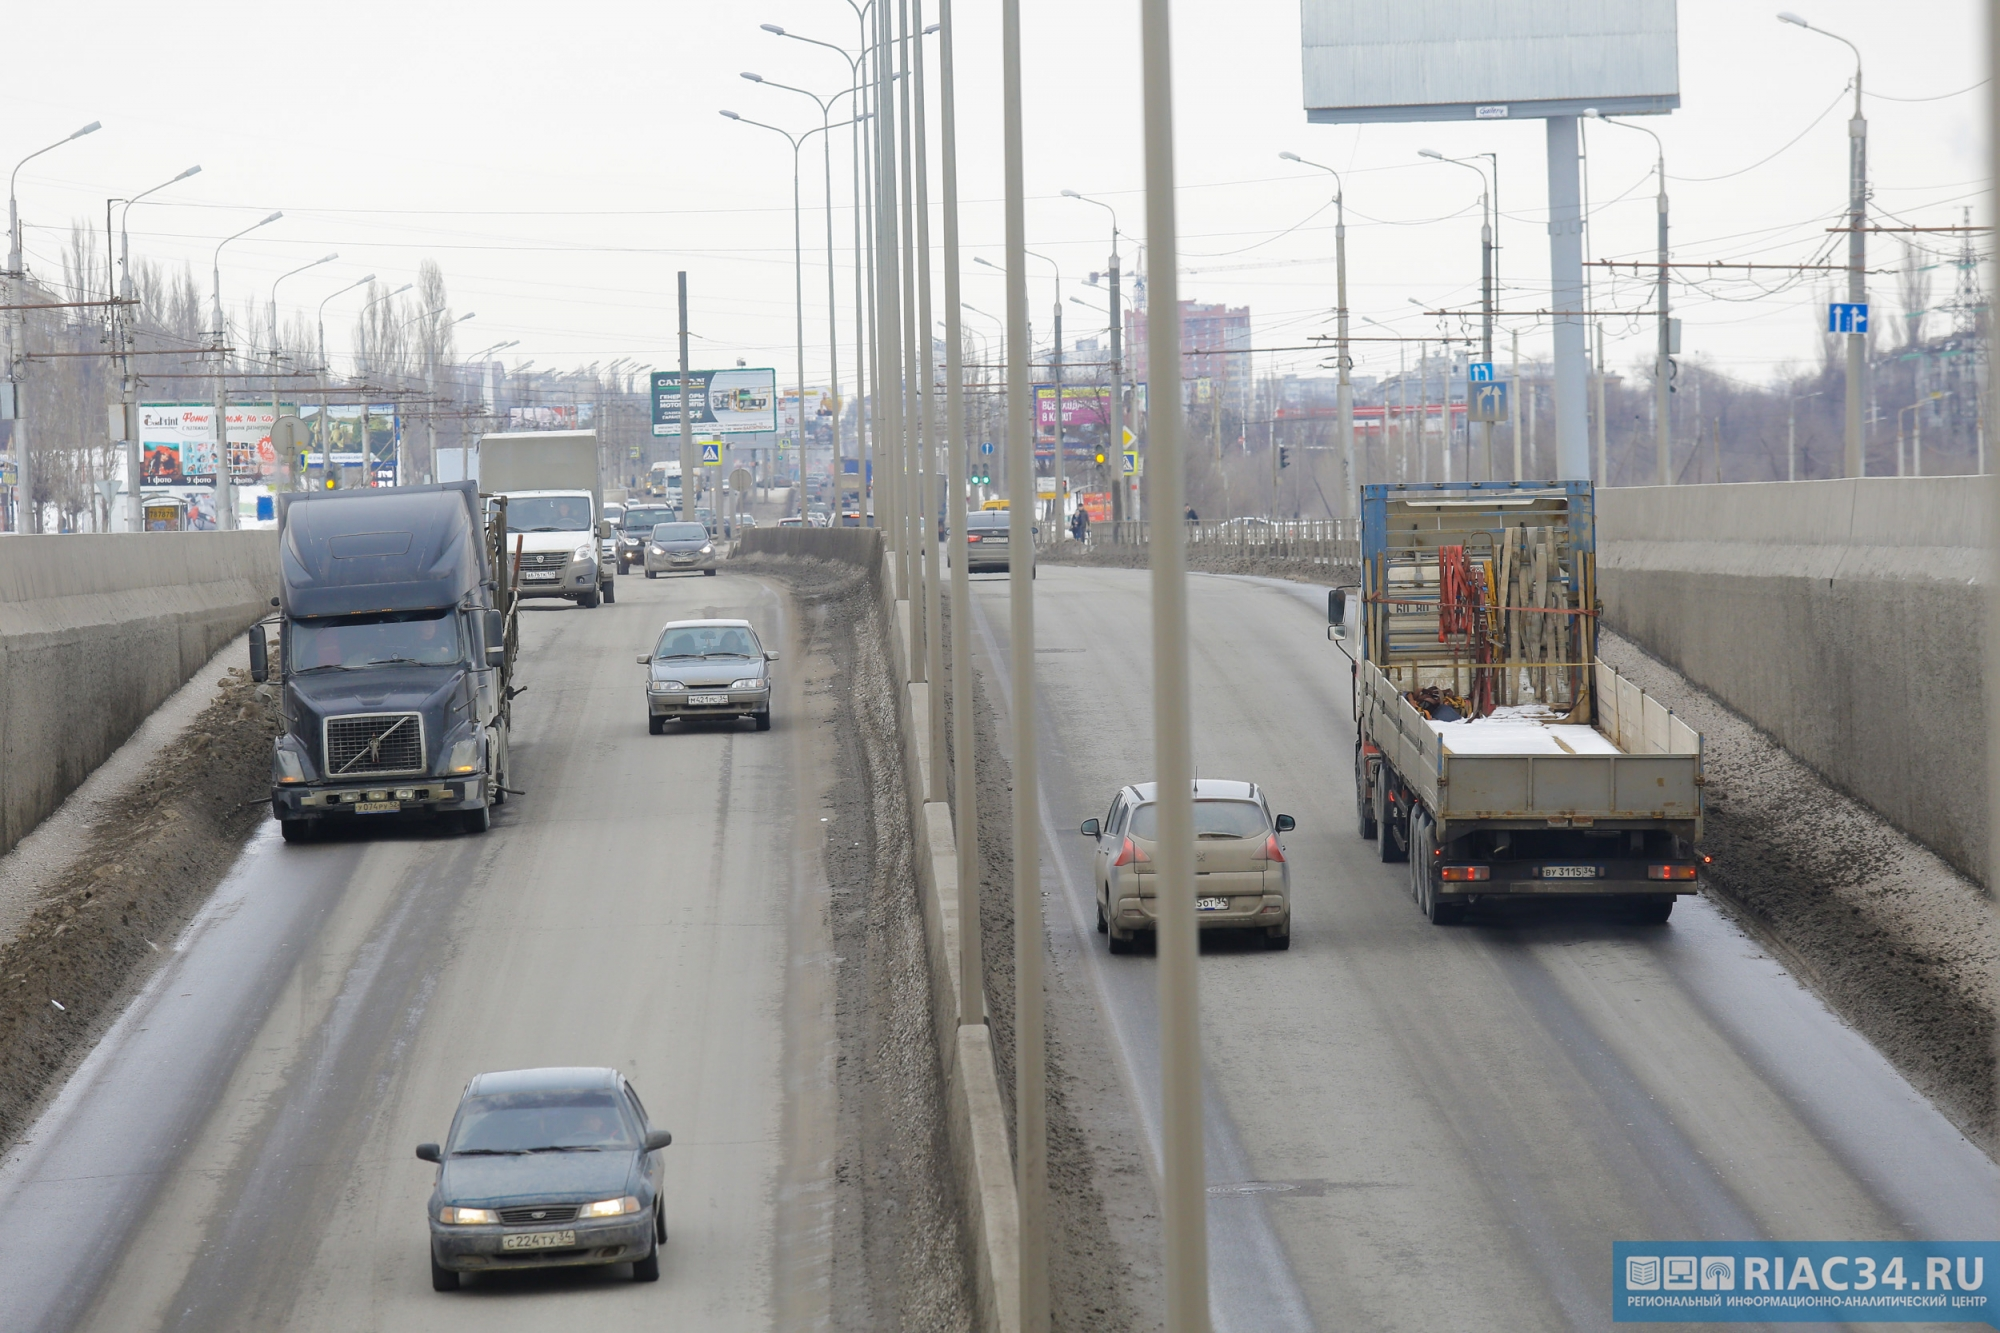 Волгоградские власти подписали соглашение осотрудничестве с«Яндекс.Такси»